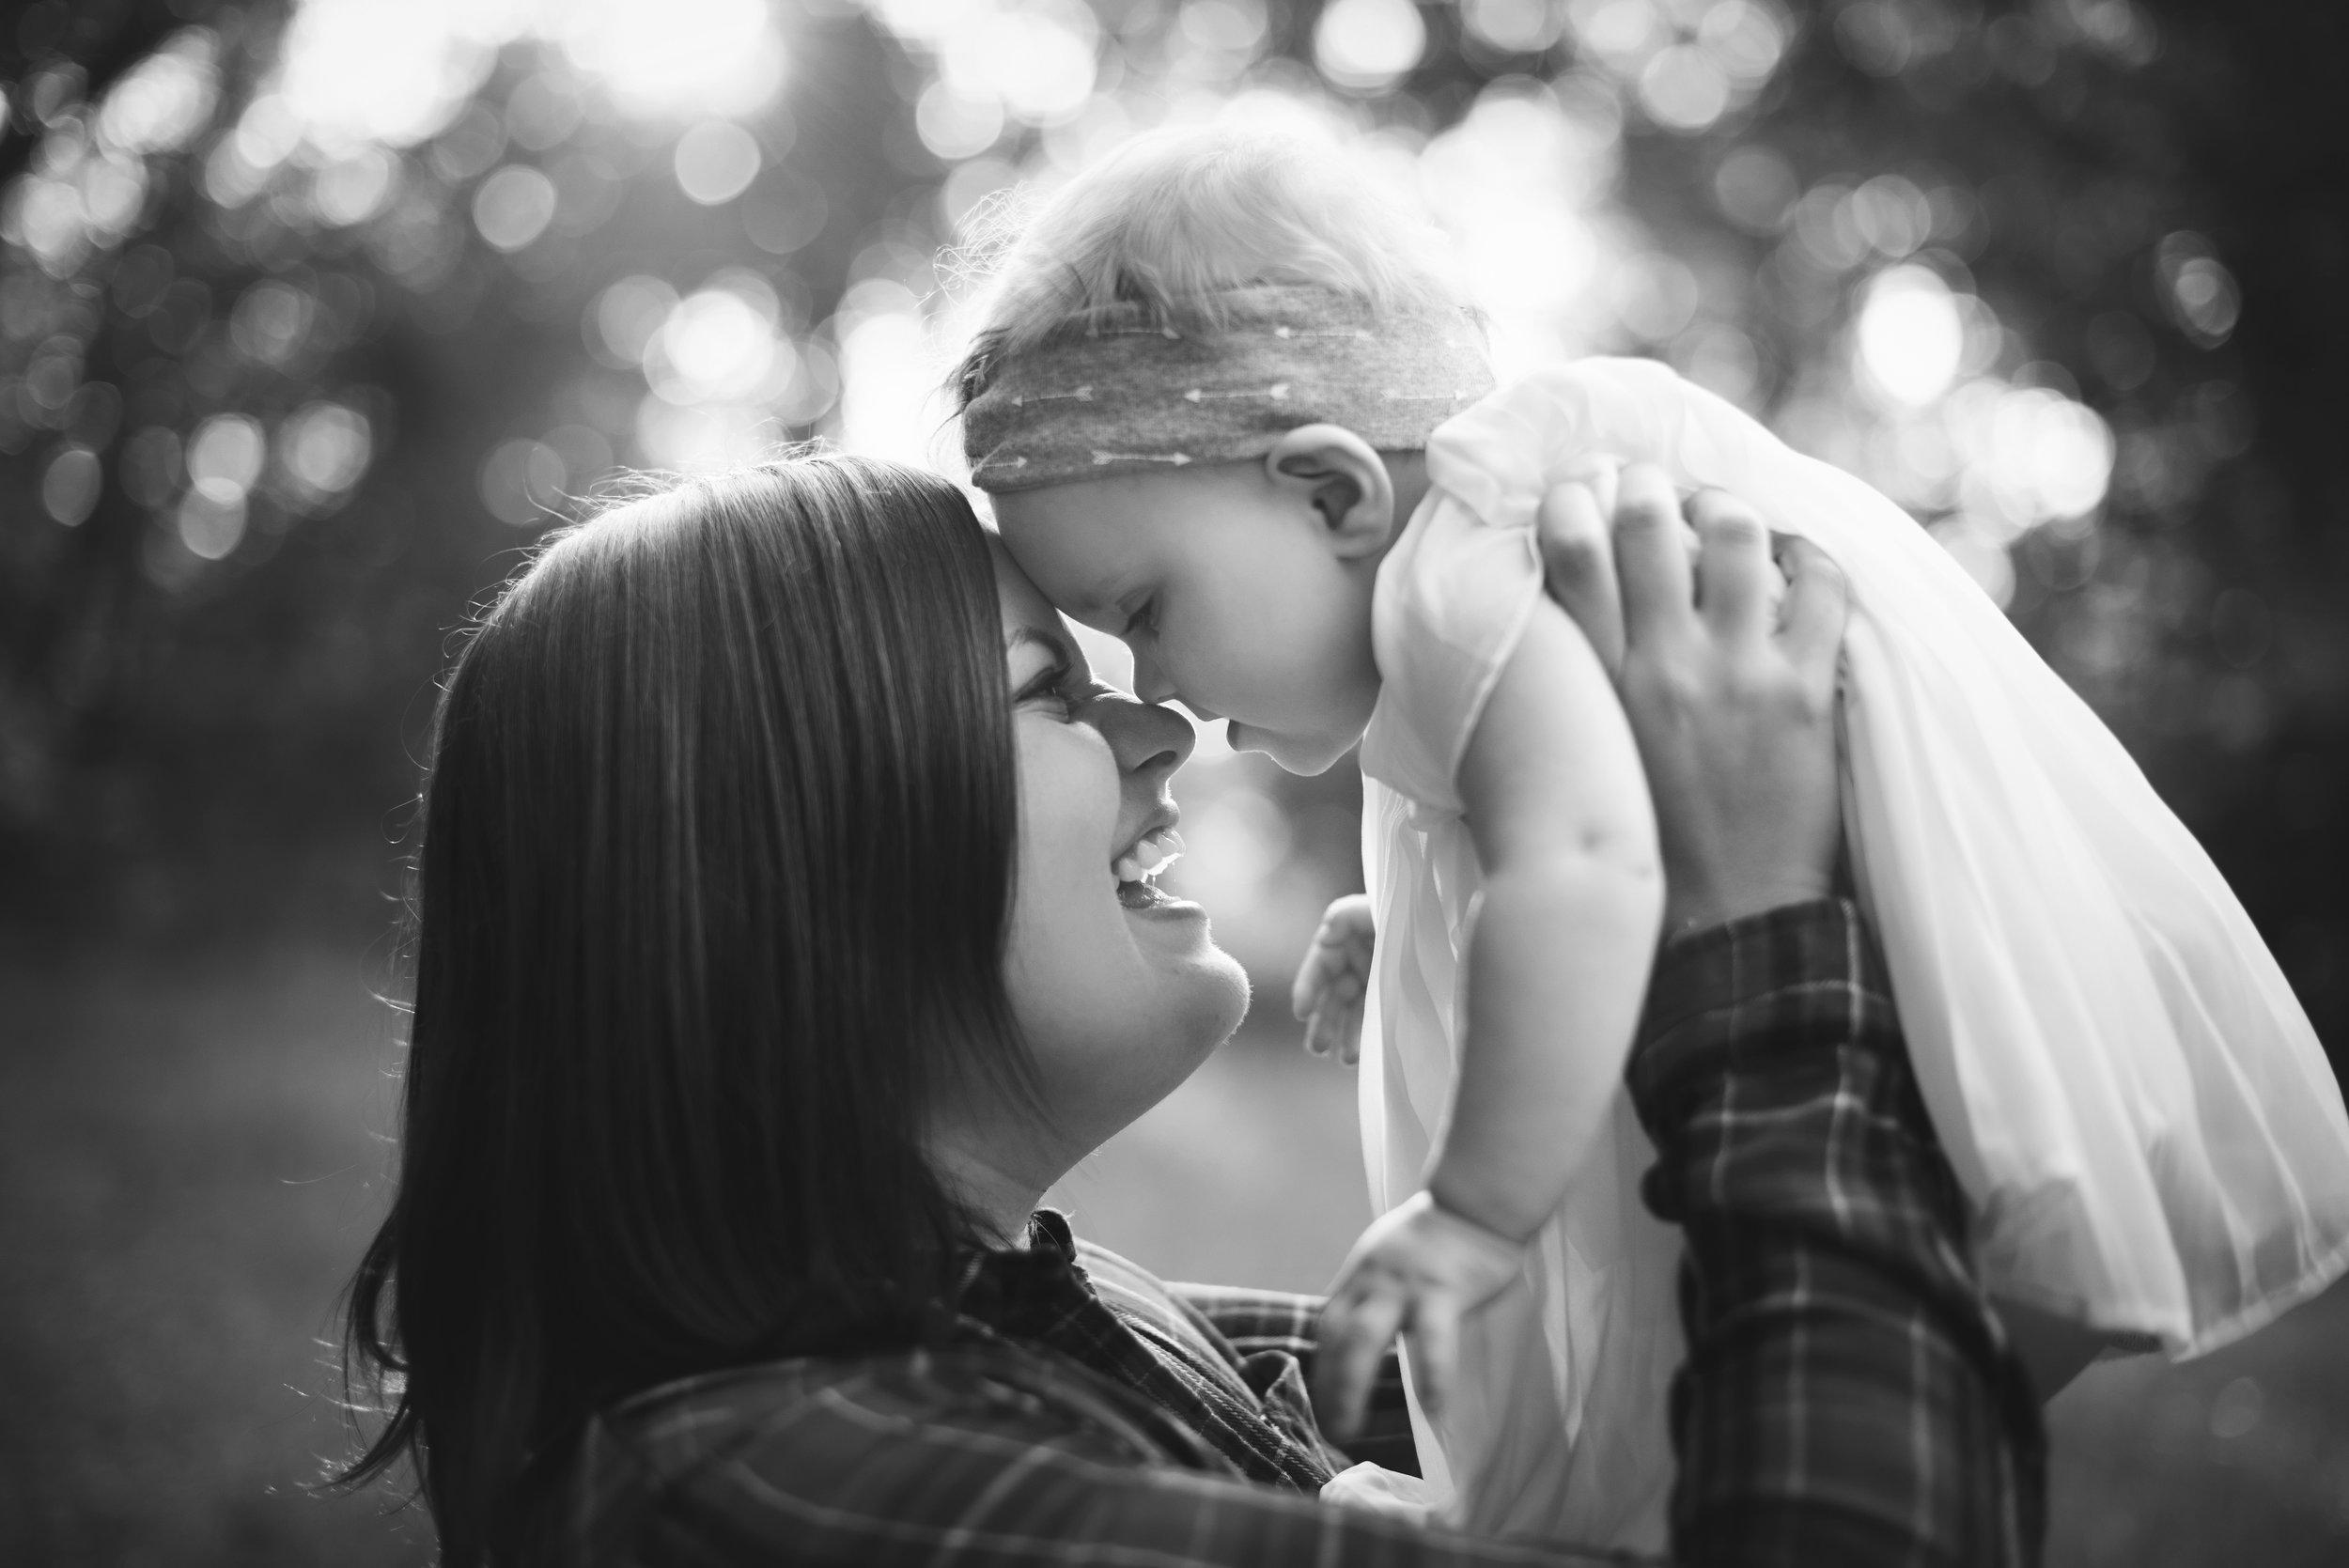 portageinfamilyphotographer-16bw.jpg